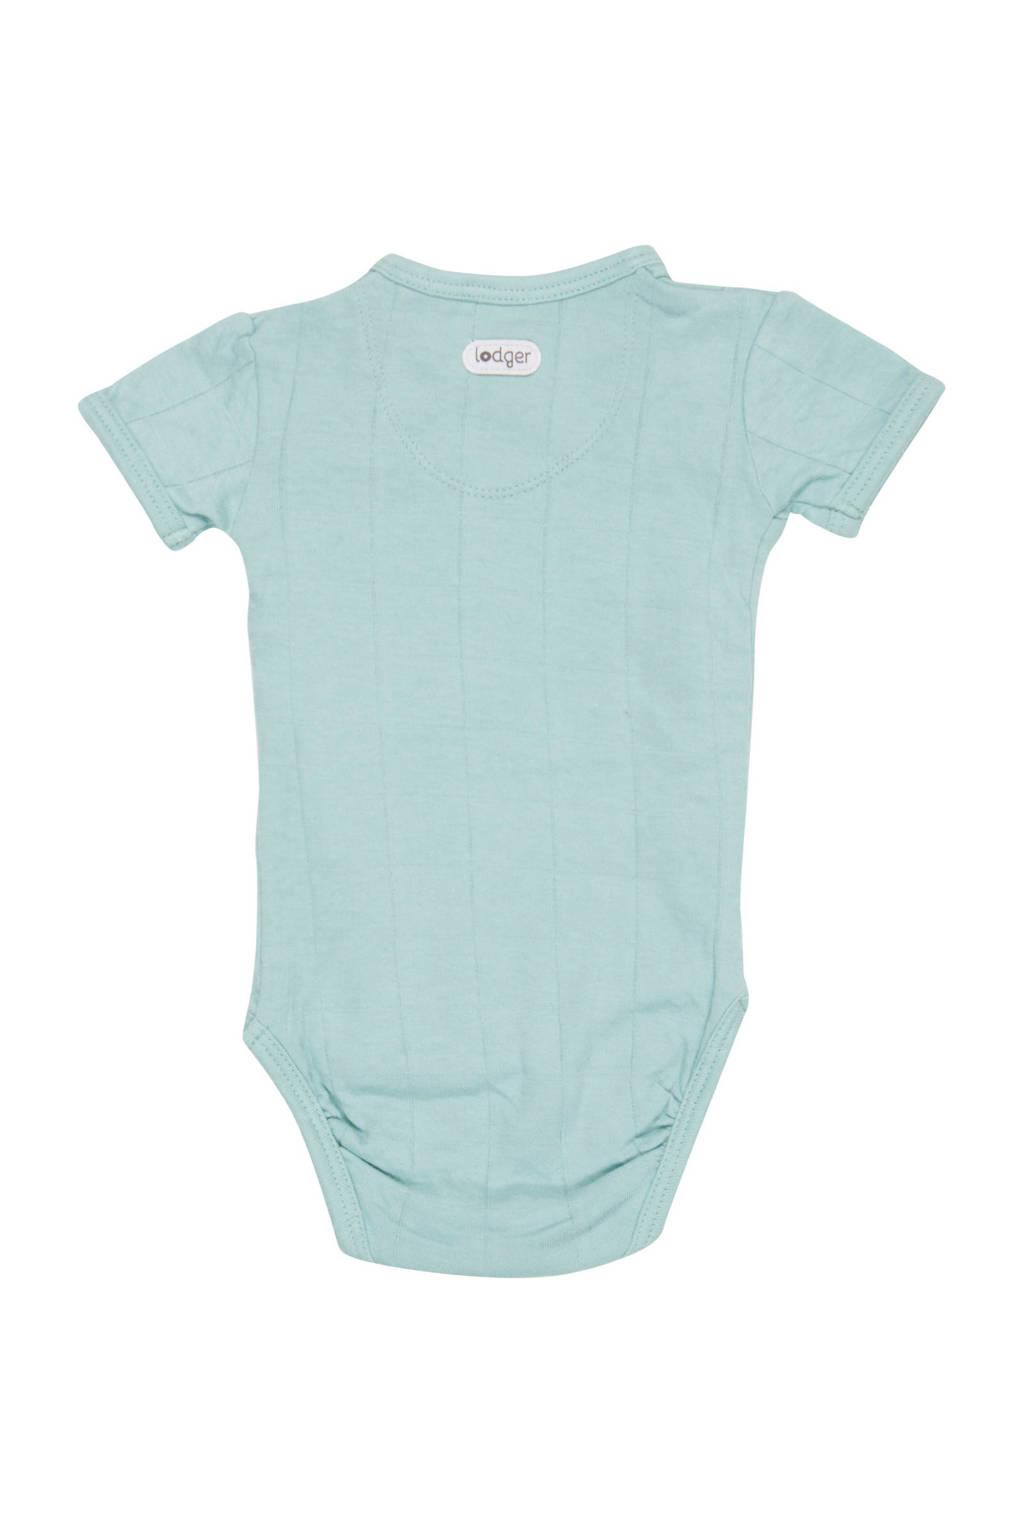 Lodger newborn baby romper Solid, Mintgroen